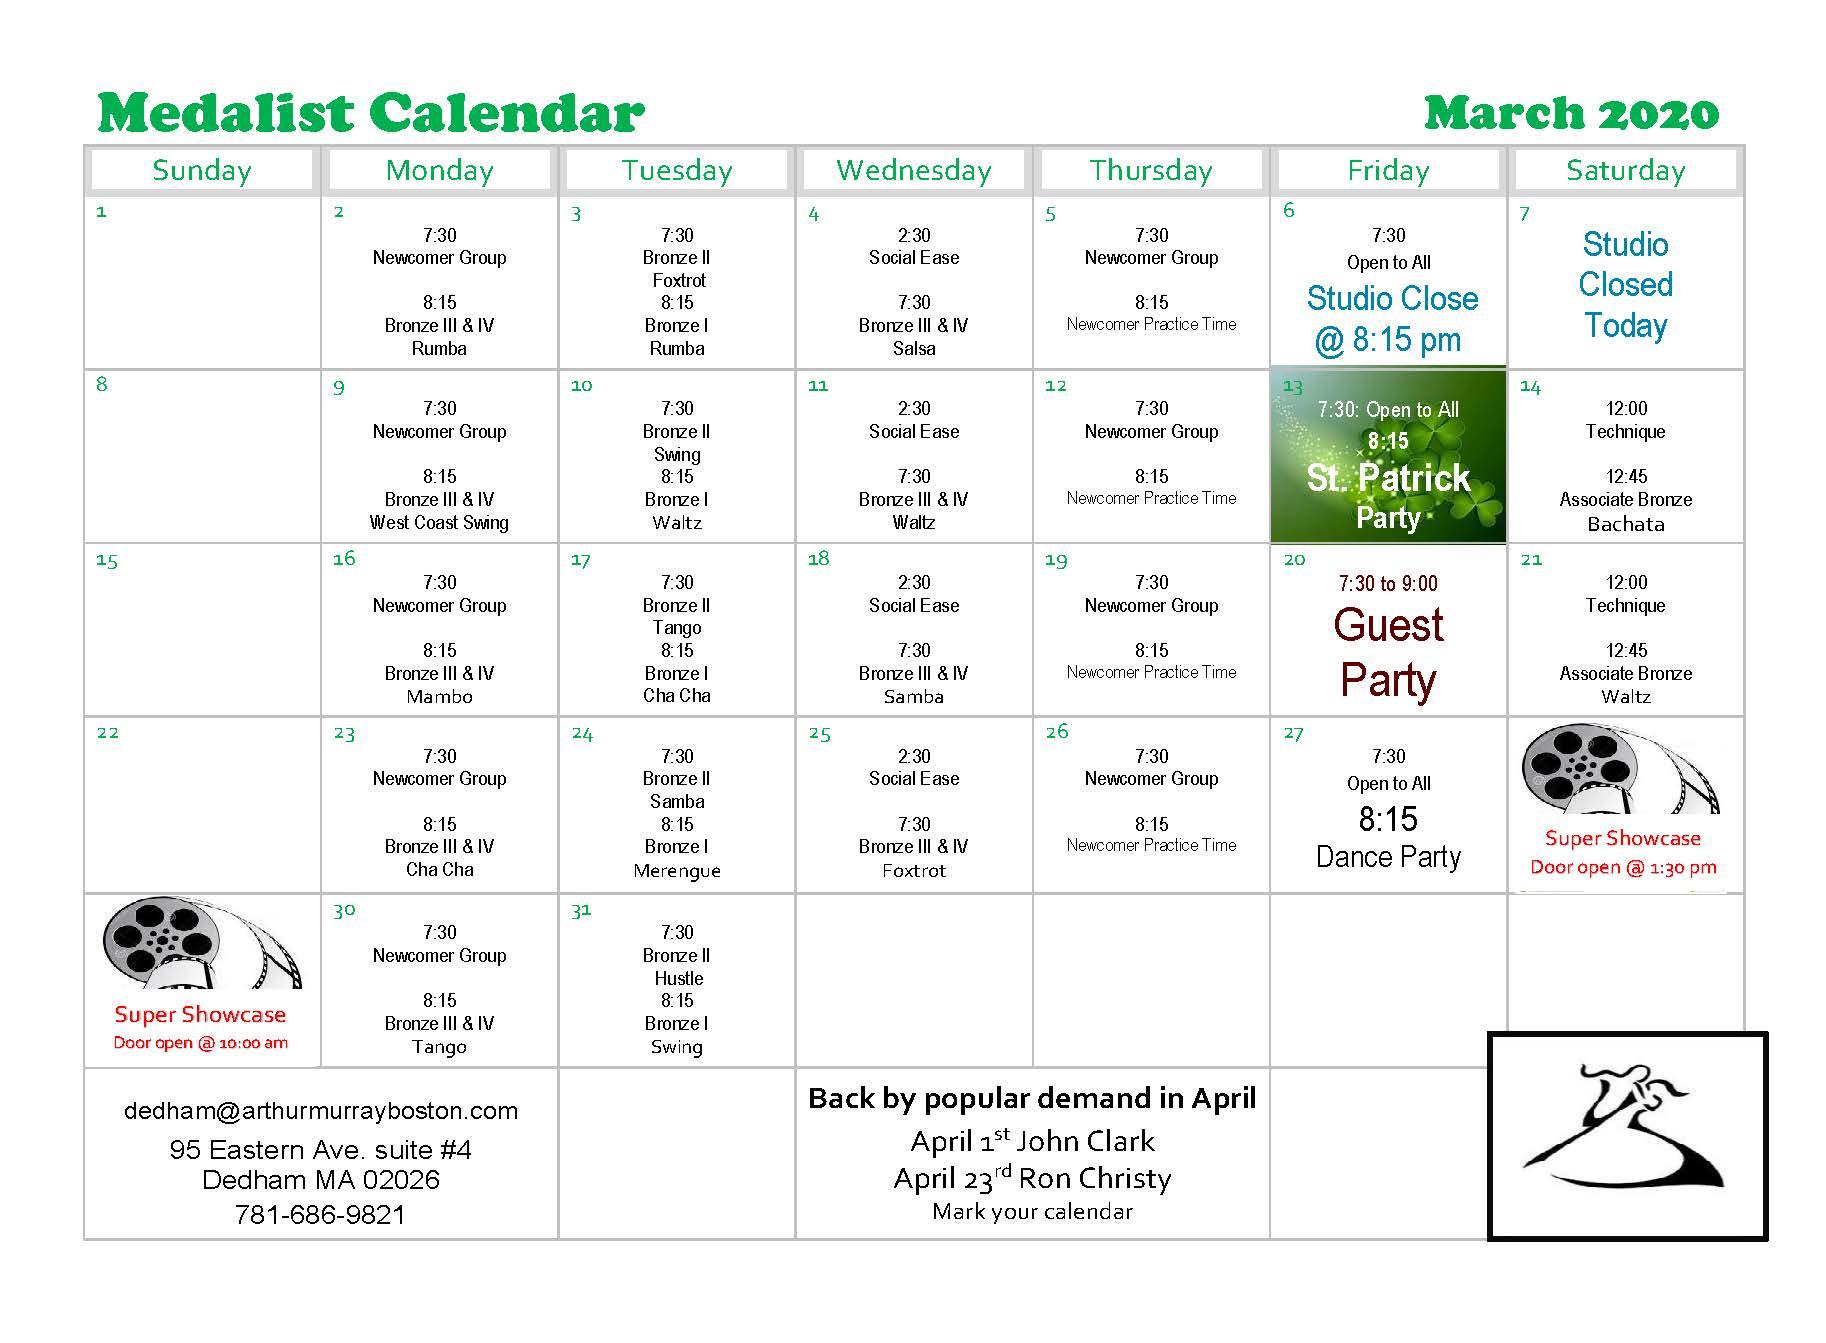 Dedham March 2020-Medalist Calendar